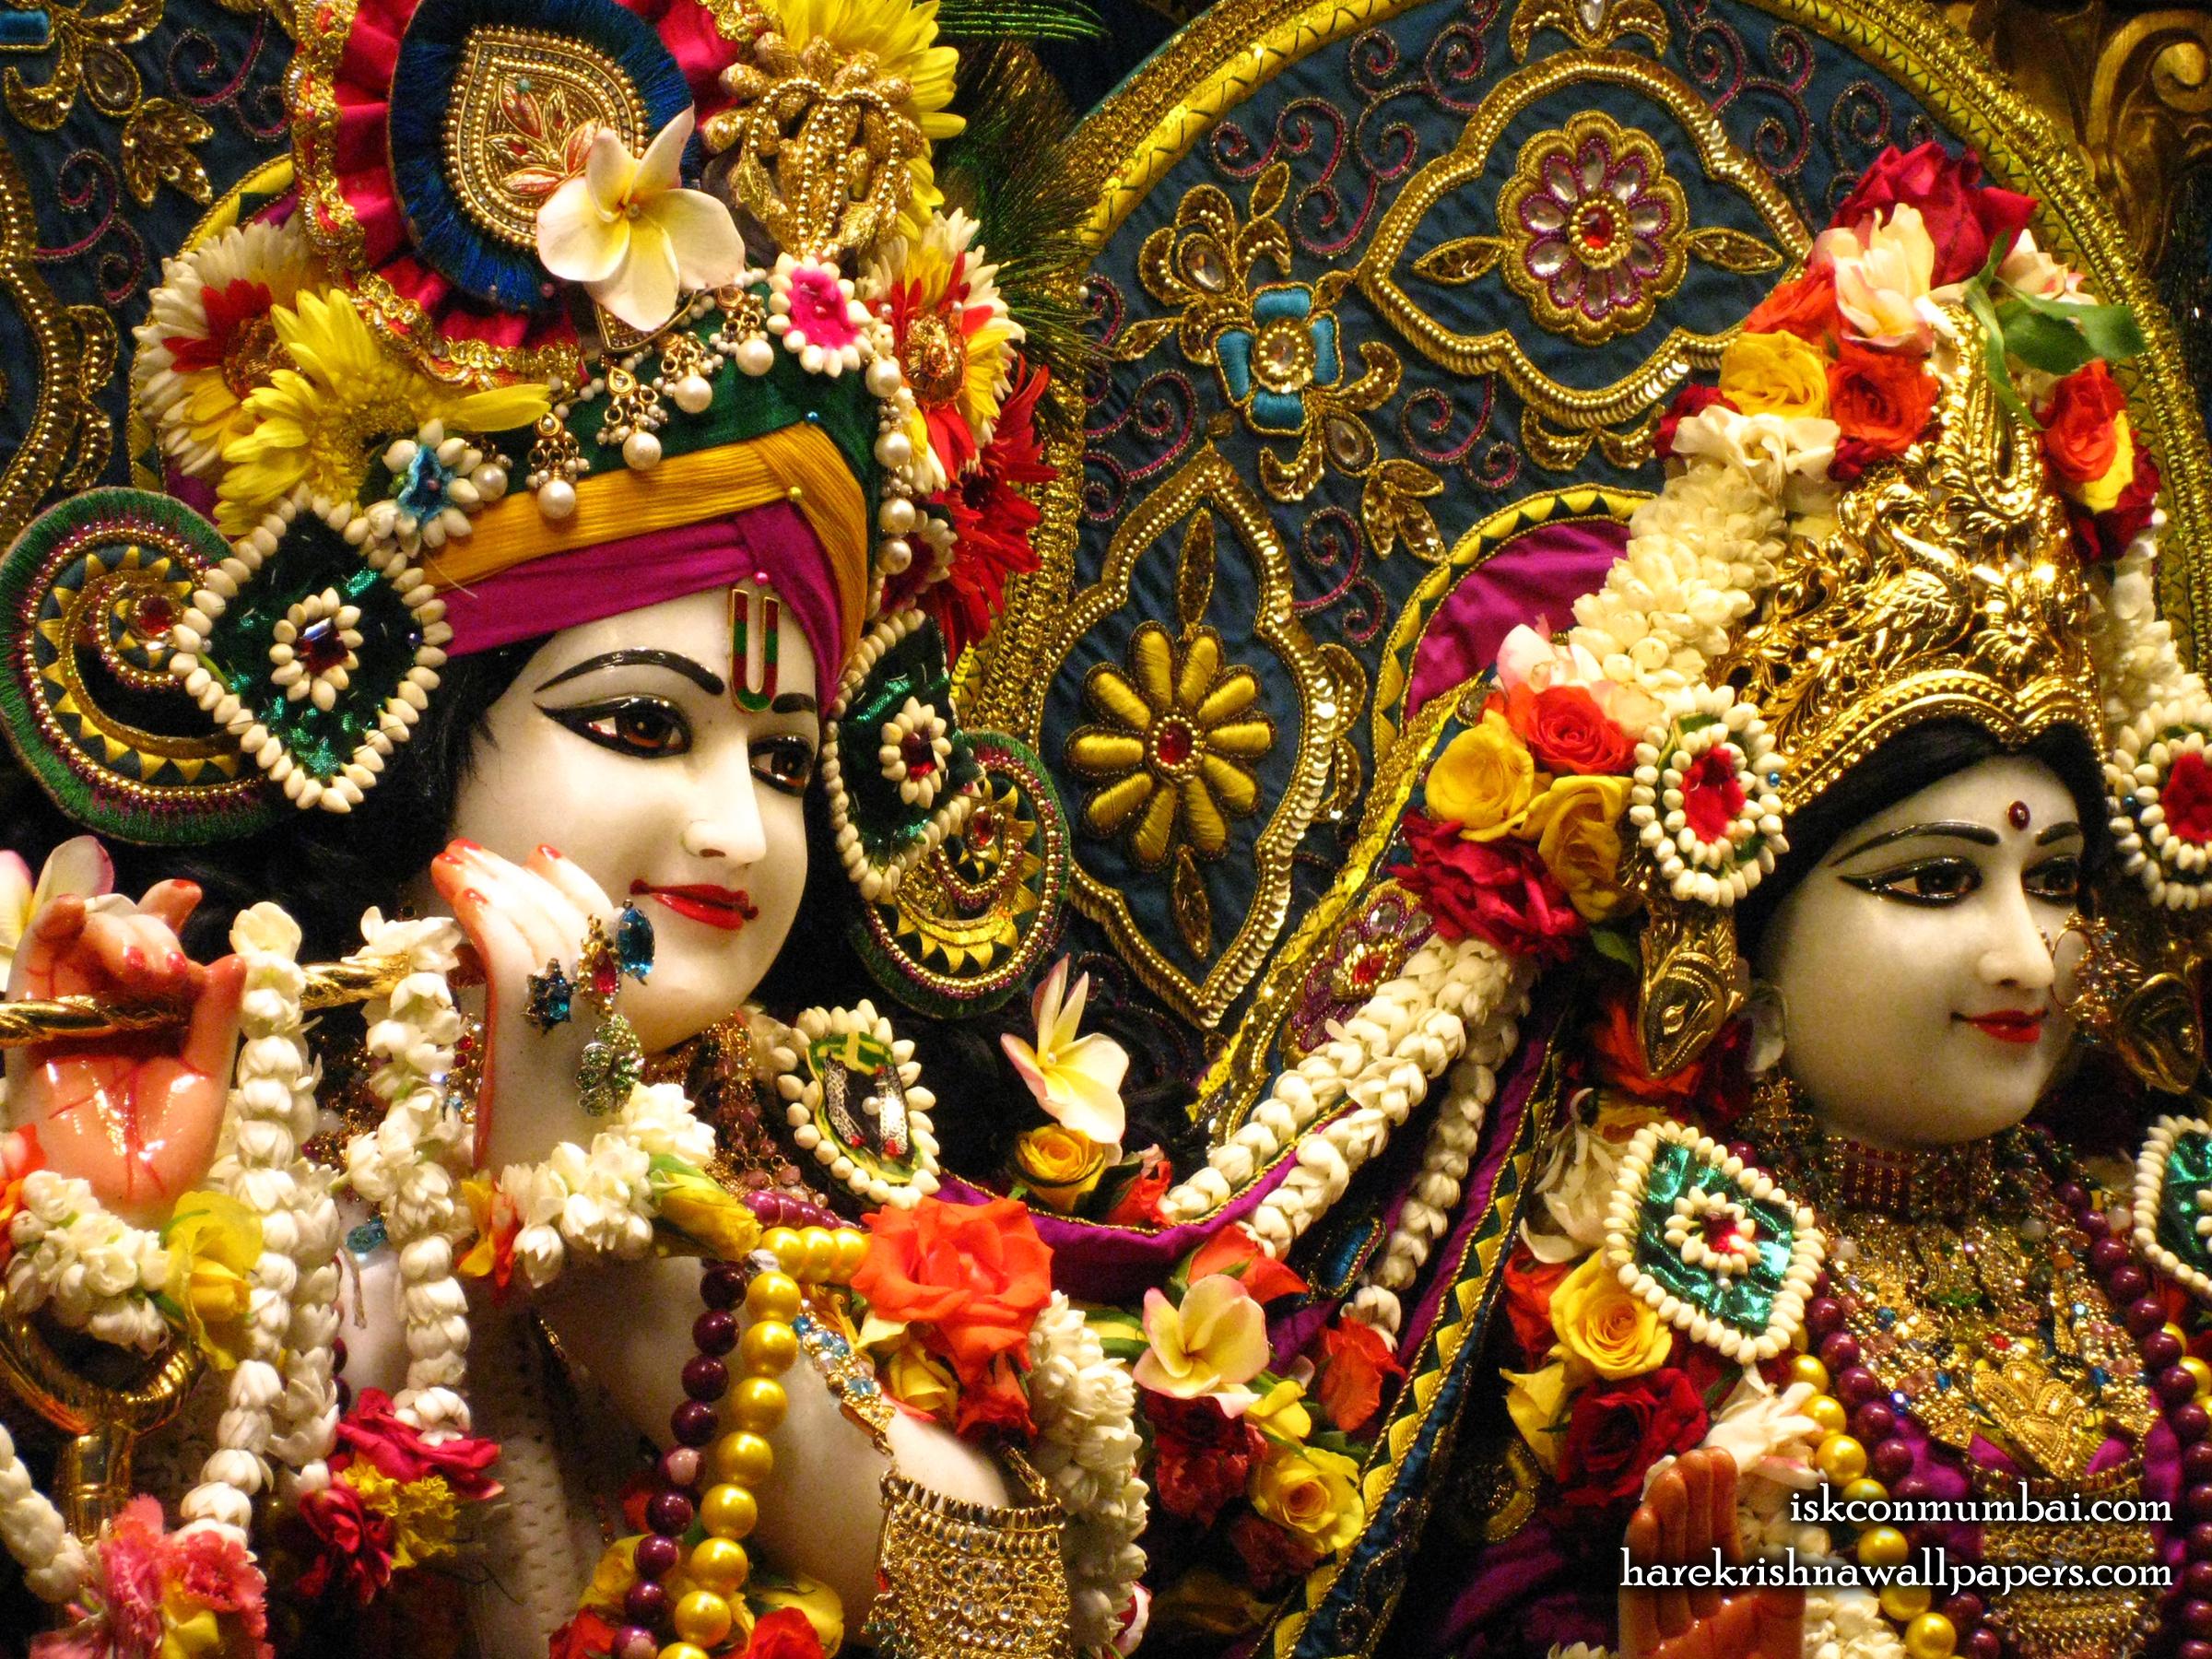 Sri Sri Radha Rasabihari Close up Wallpaper (027) Size 2400x1800 Download